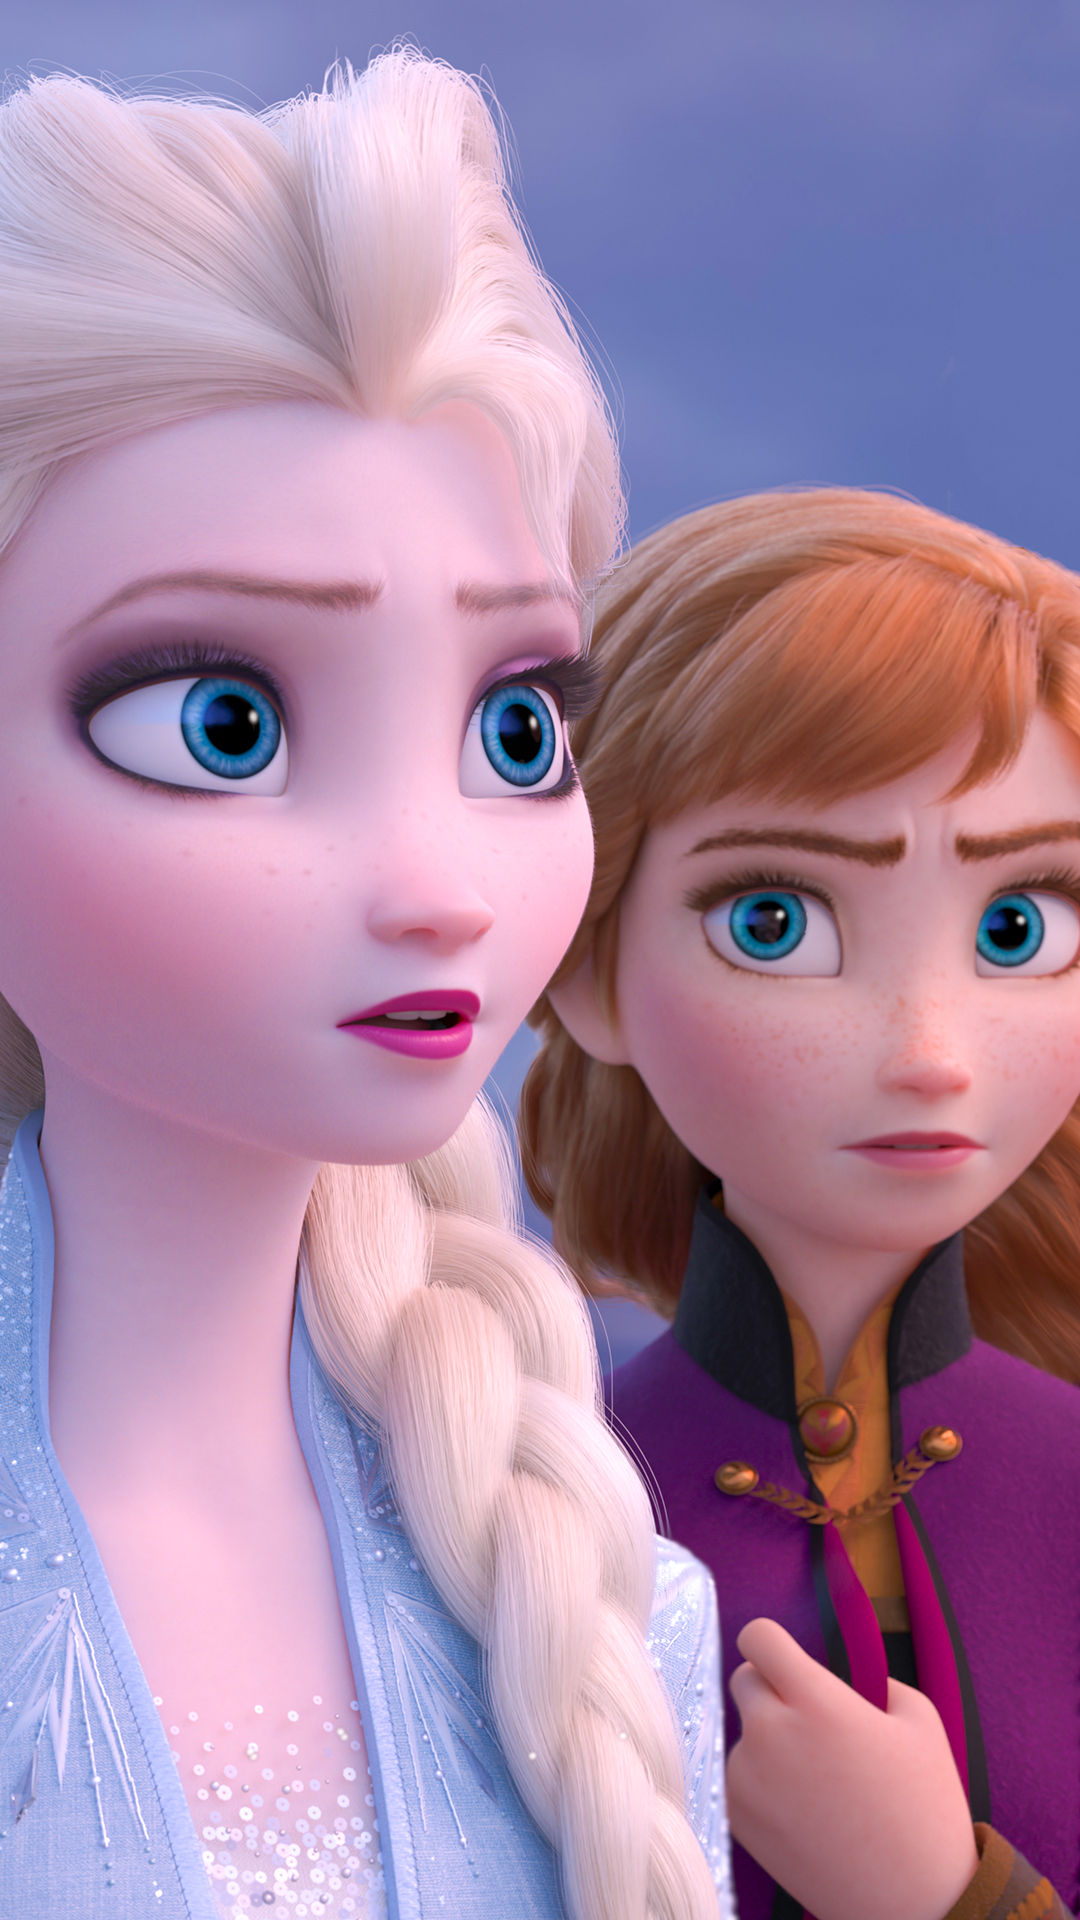 Disney Frozen 2 first HD wallpapers - YouLoveIt.com